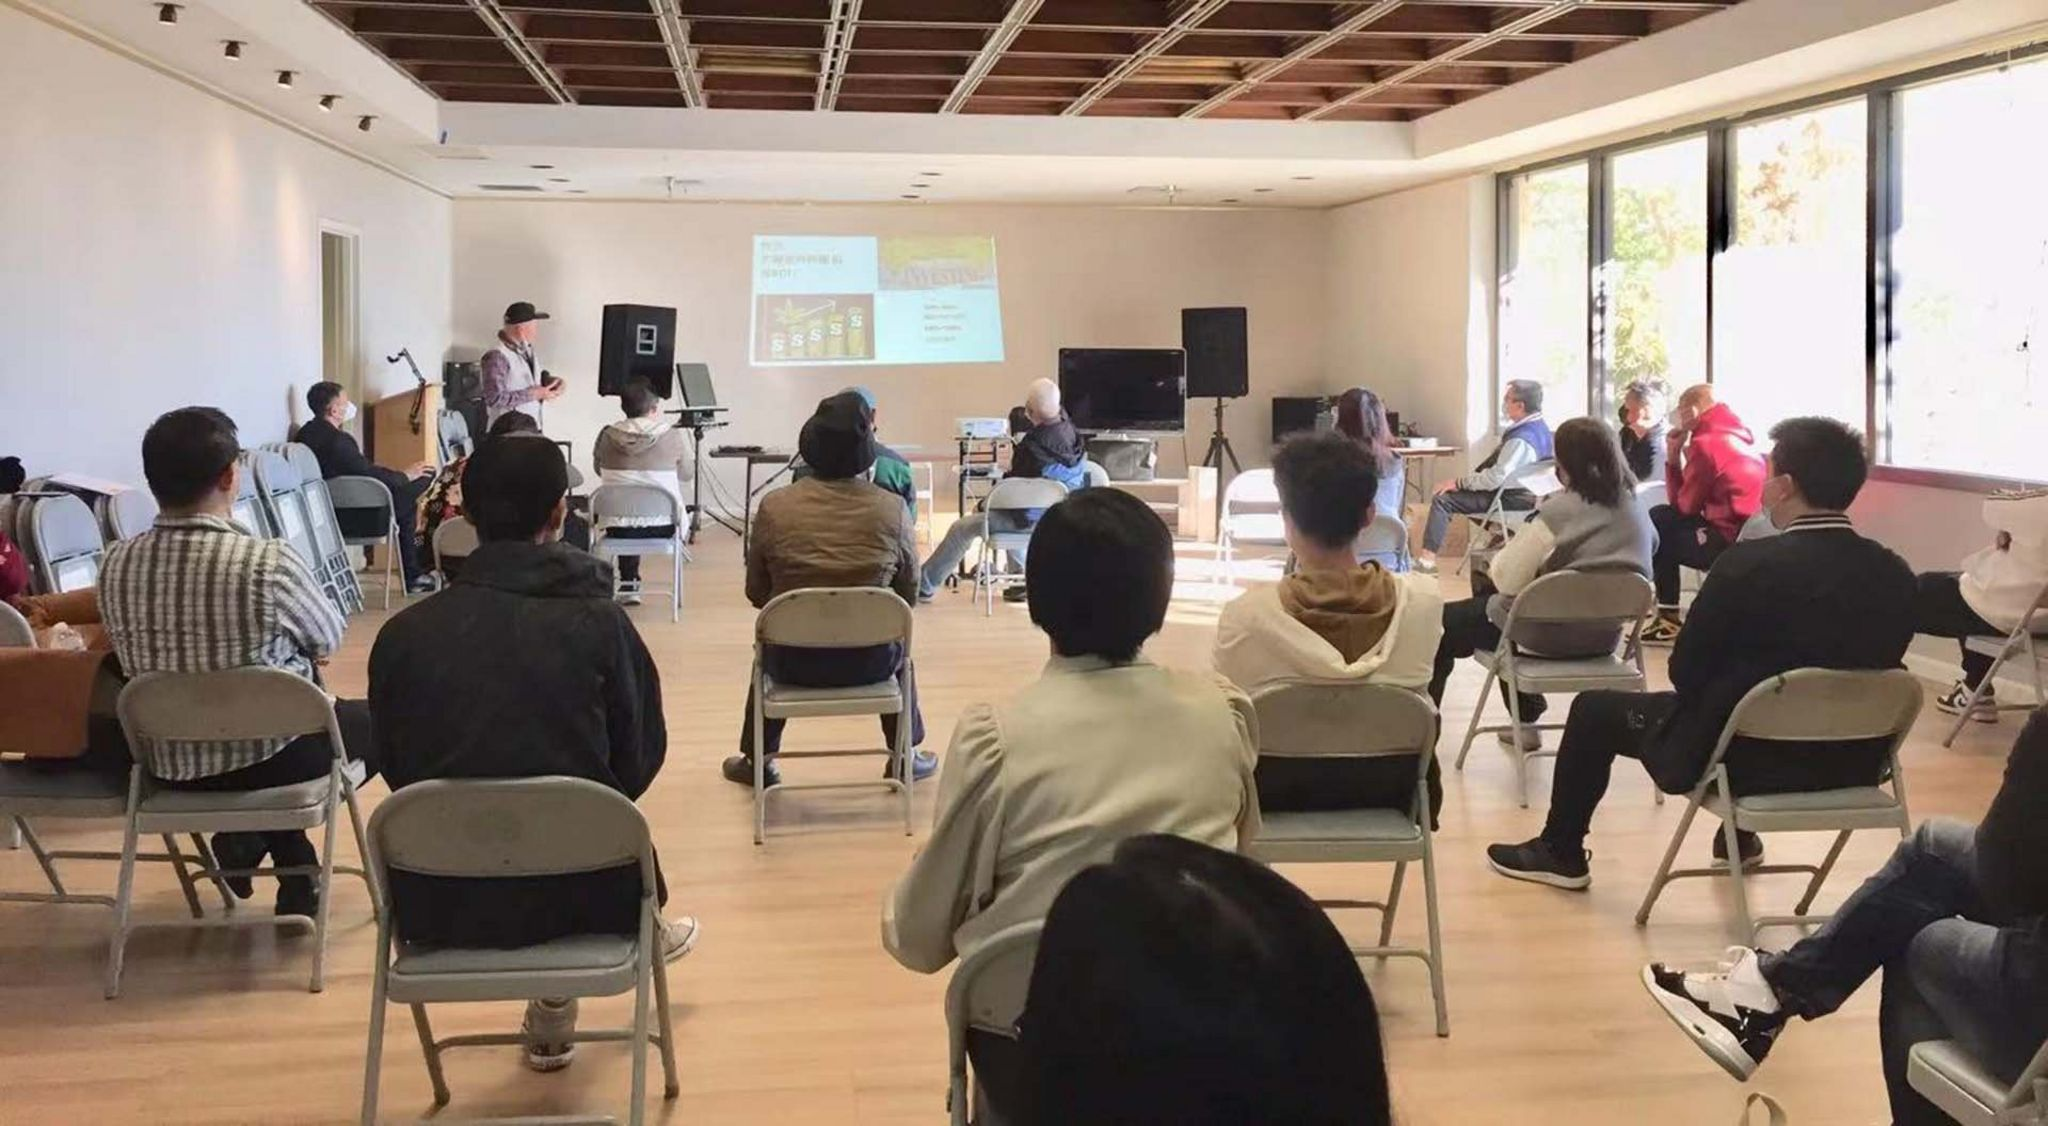 Irving Lin ran socially-distanced seminars during the pandemic